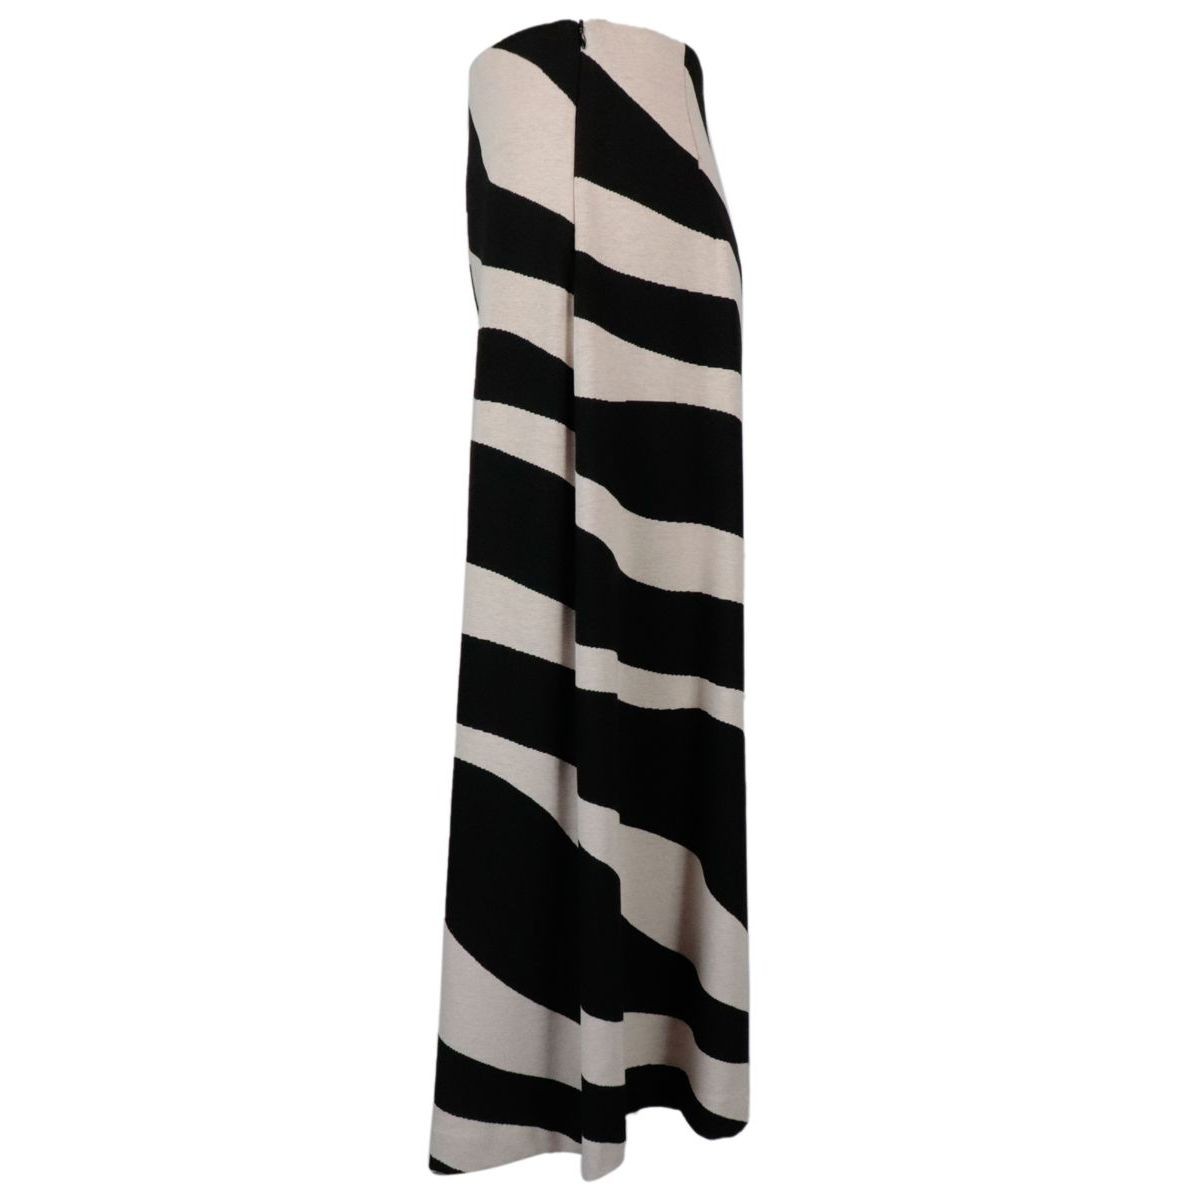 Cropped Lute trousers in viscose knit effect Powder / black Max Mara